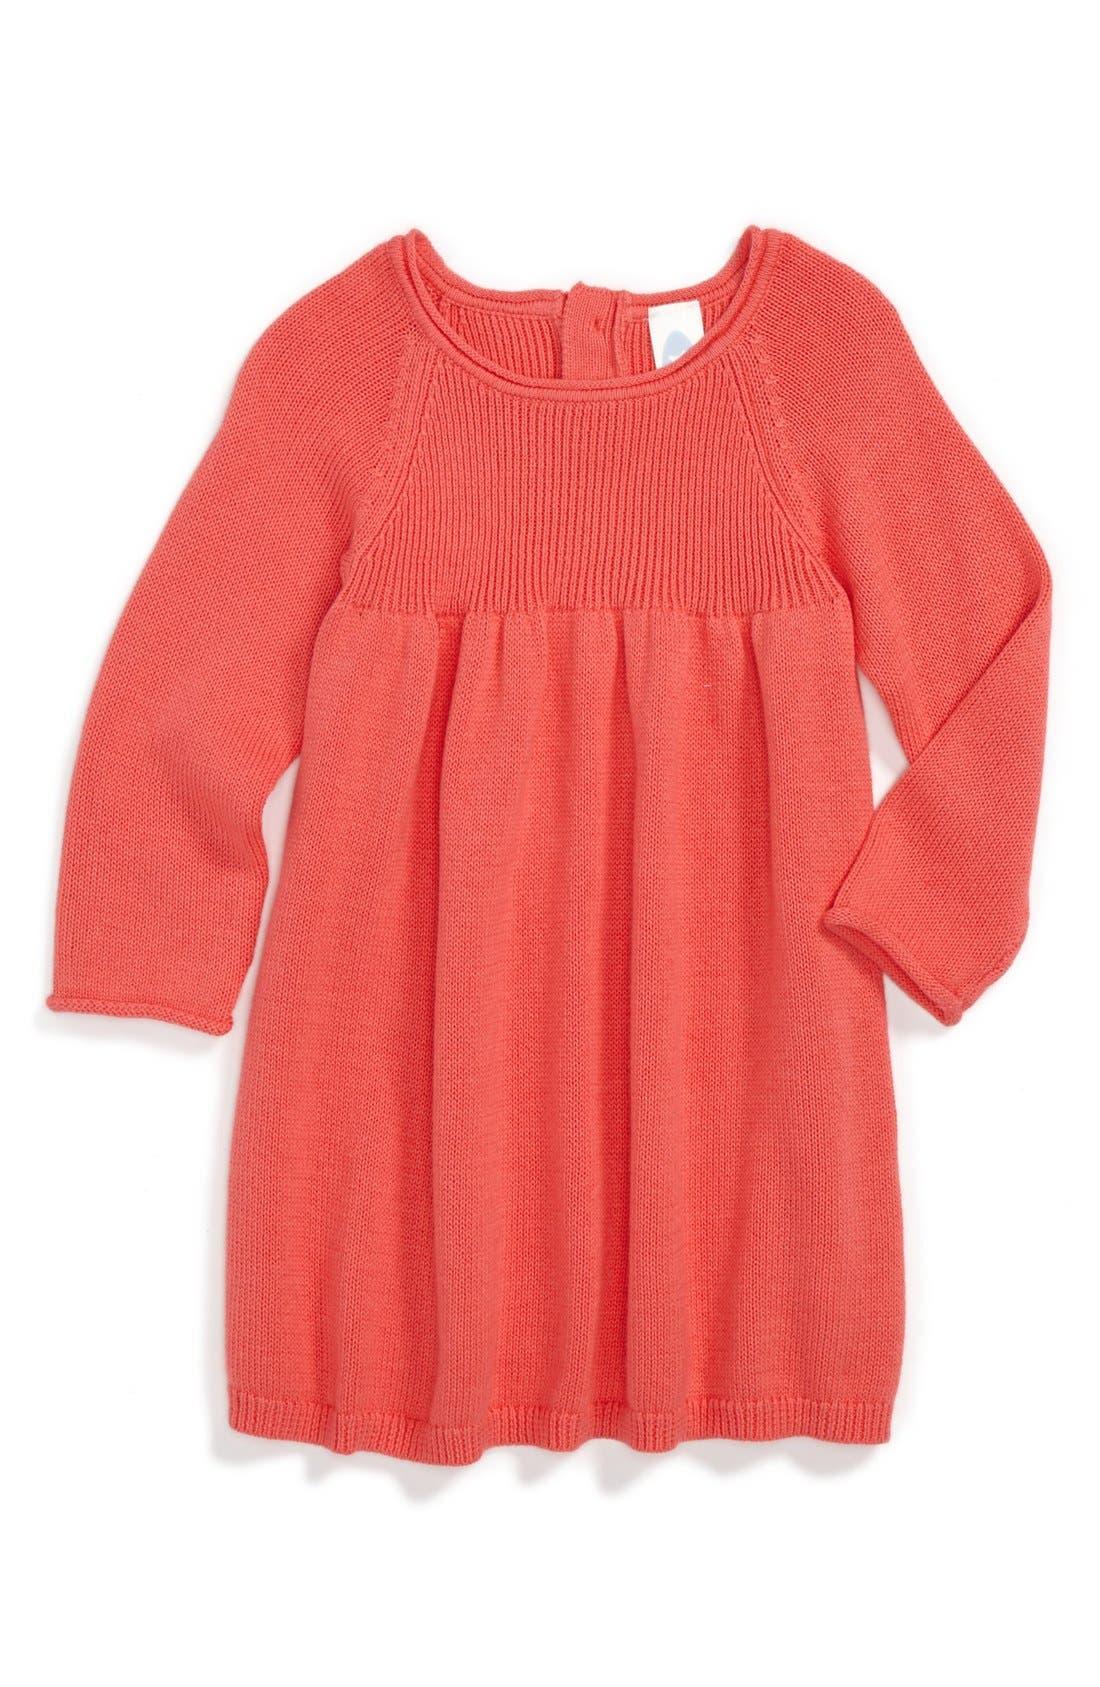 Alternate Image 1 Selected - Stem Baby Sweater Dress (Baby Girls)